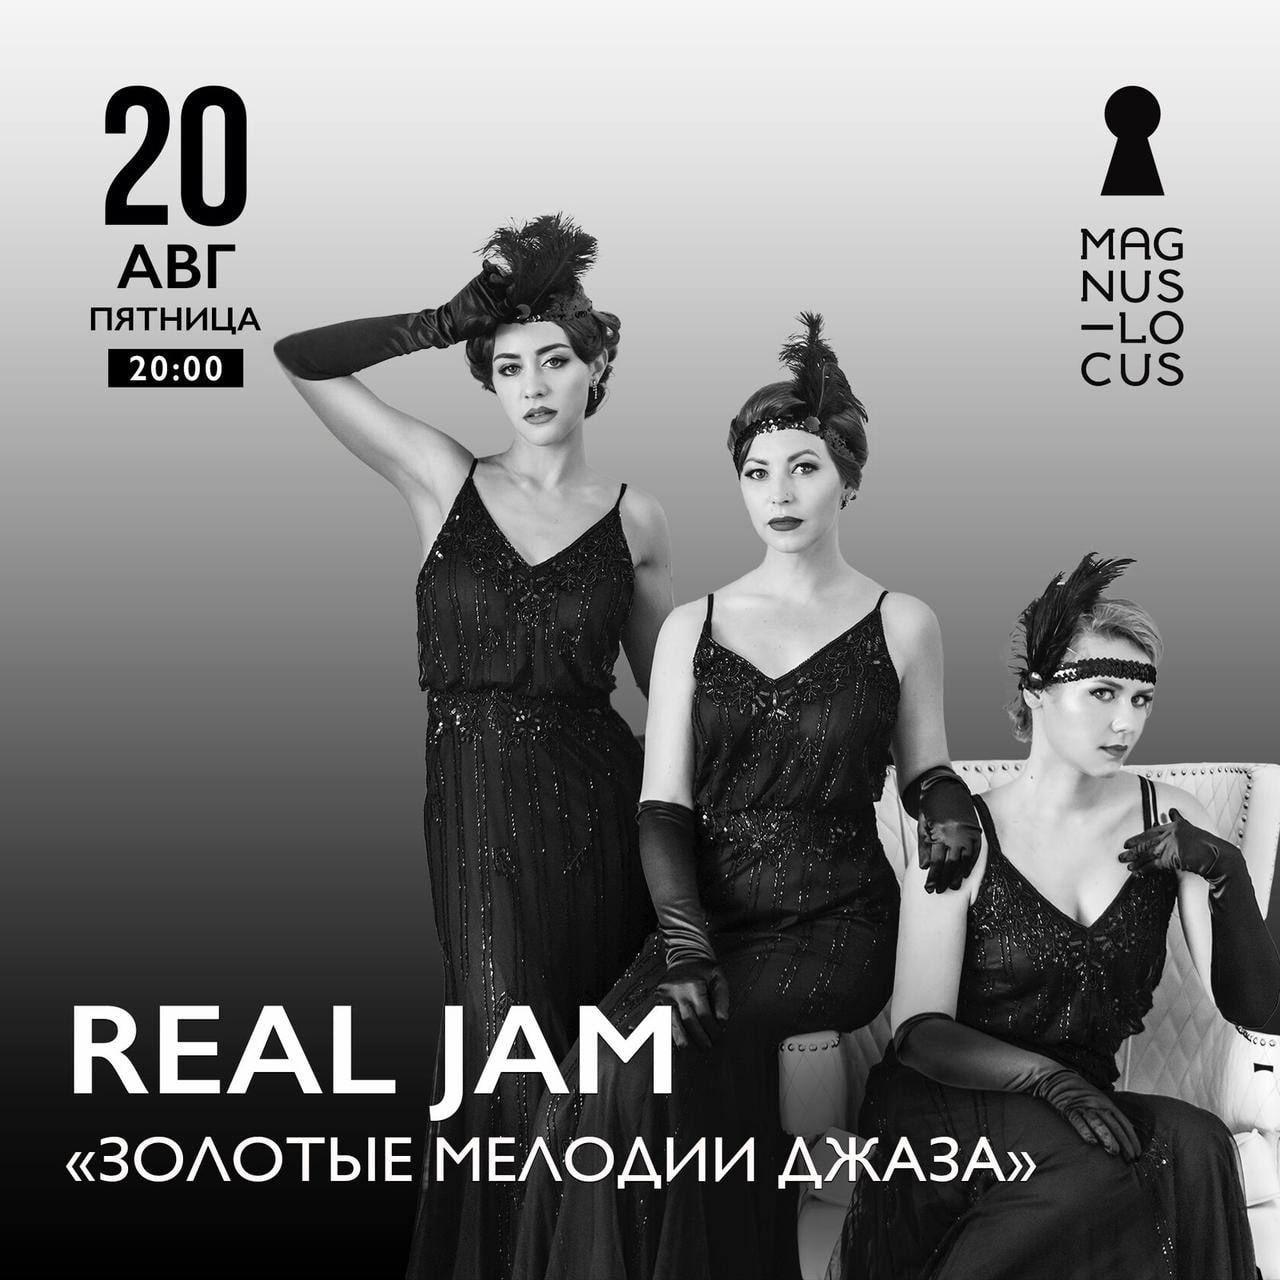 20.08 Трио Real Jam в клубе Magnus Locus!